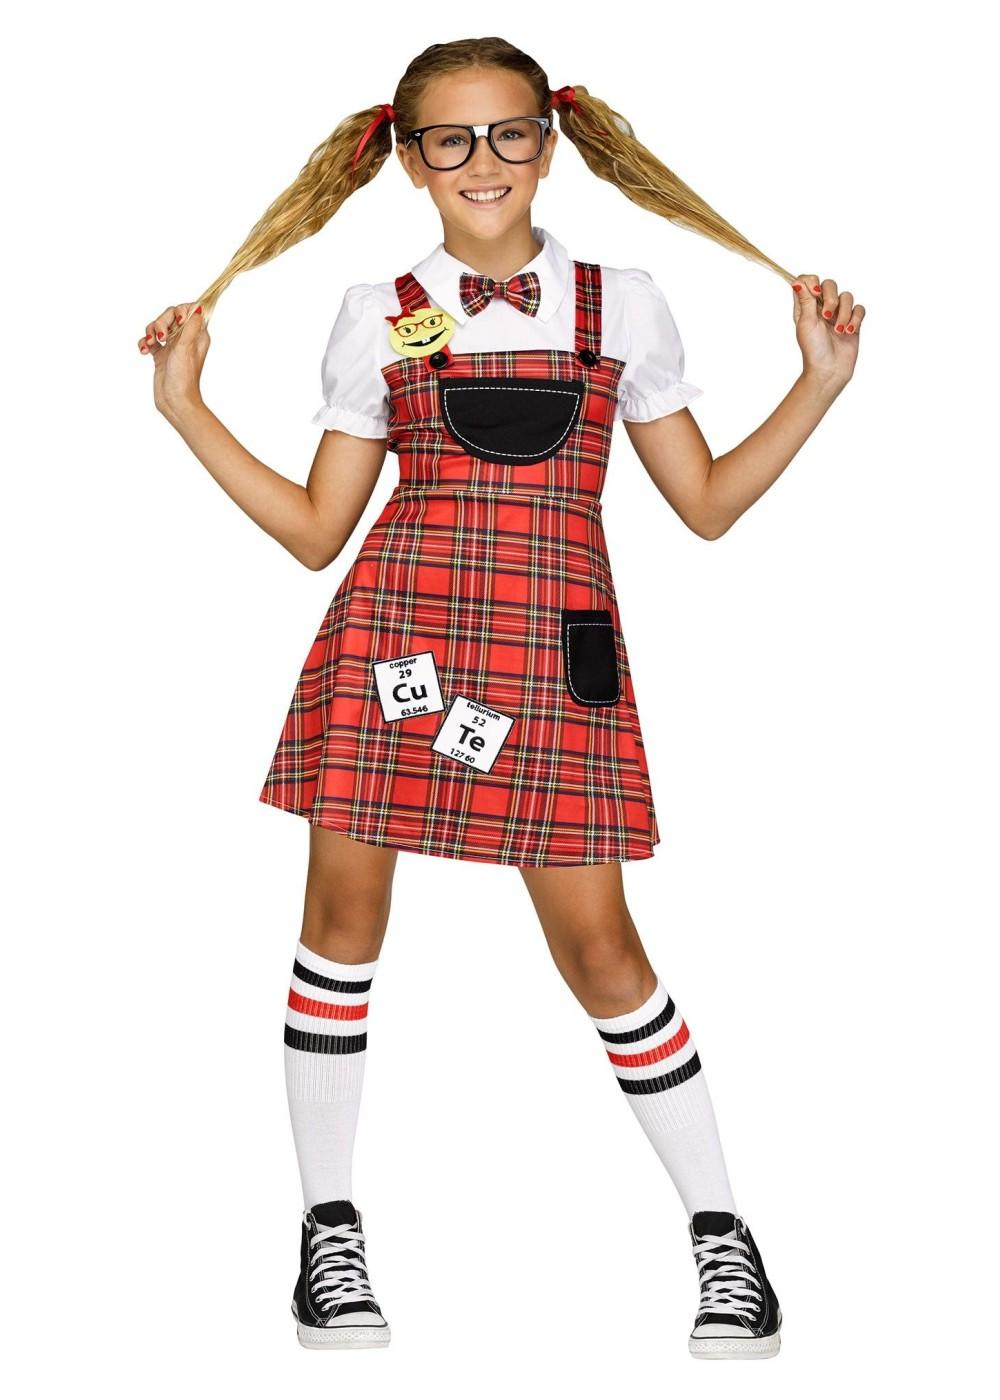 Nerd Girl Costume - Funny Costumes